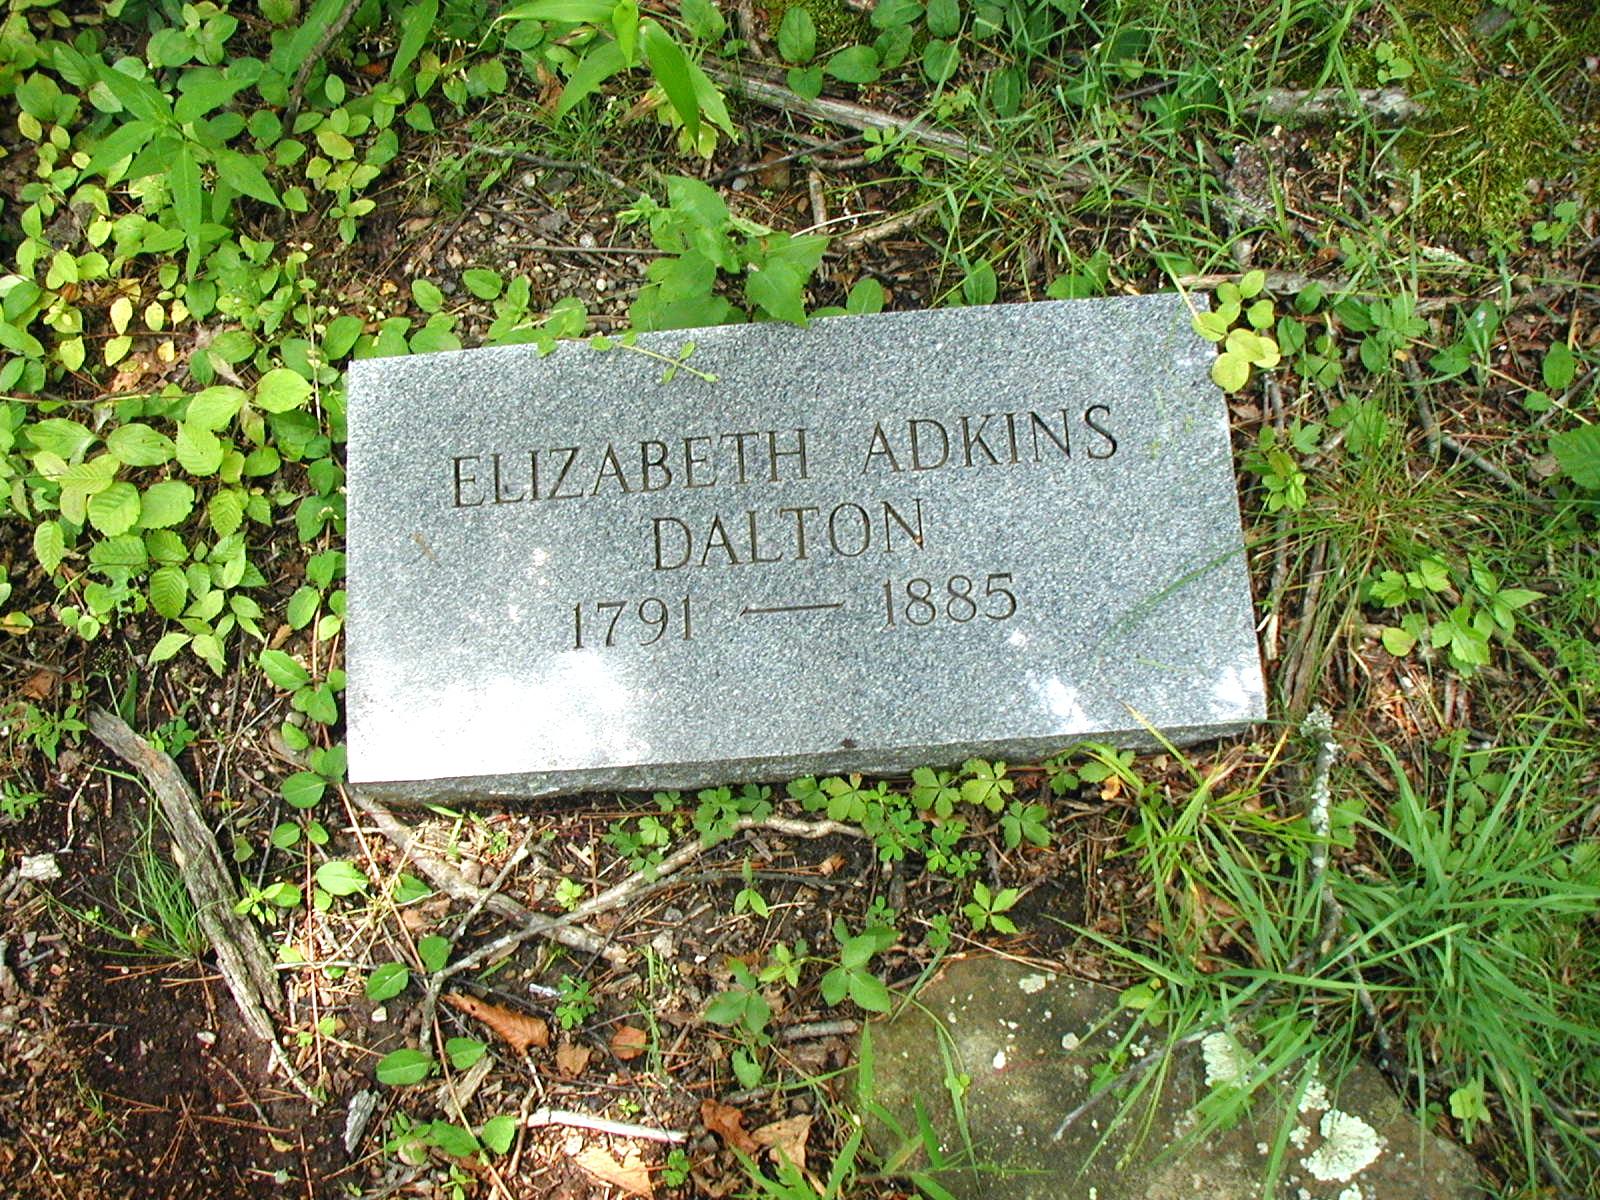 Elizabeth (Adkins) Adkins grave in the Adkins Family Cemetery at Harts, WV. Photo by Brandon Kirk.